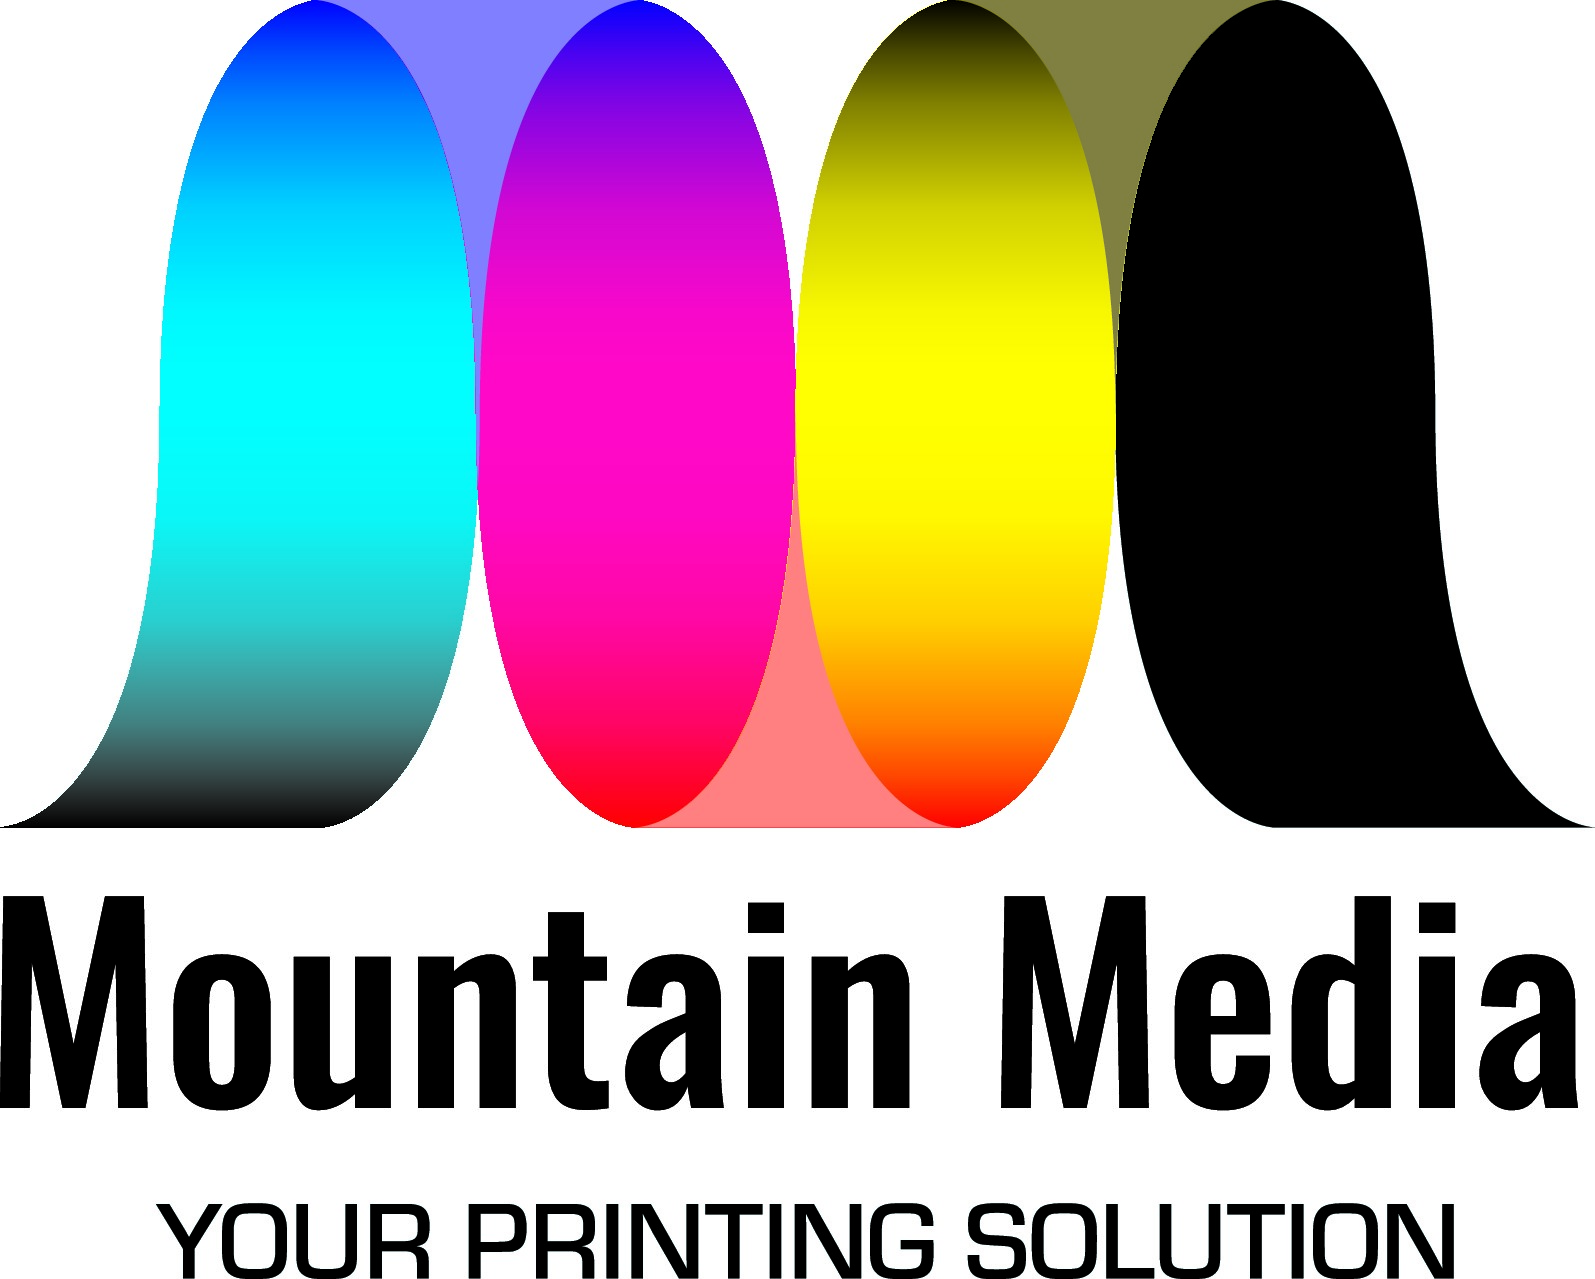 Copy of Mountain Media